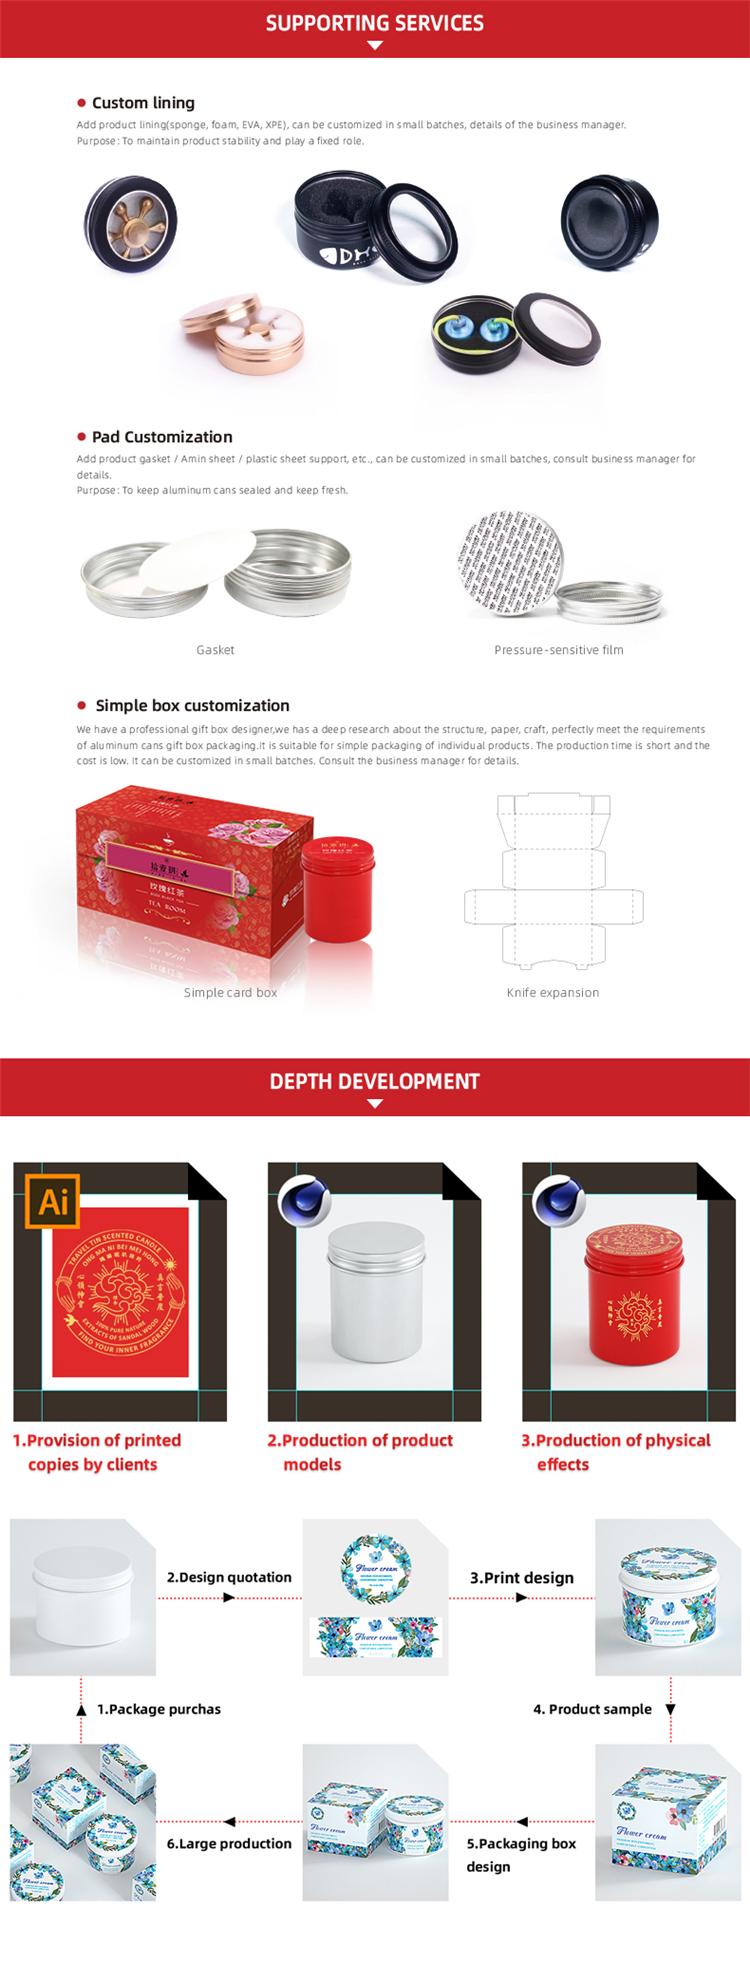 10 g/ml LH3518 oogcrème aluminium kan poeder pot lippenbalsem jar 10g cosmetica blikken doos